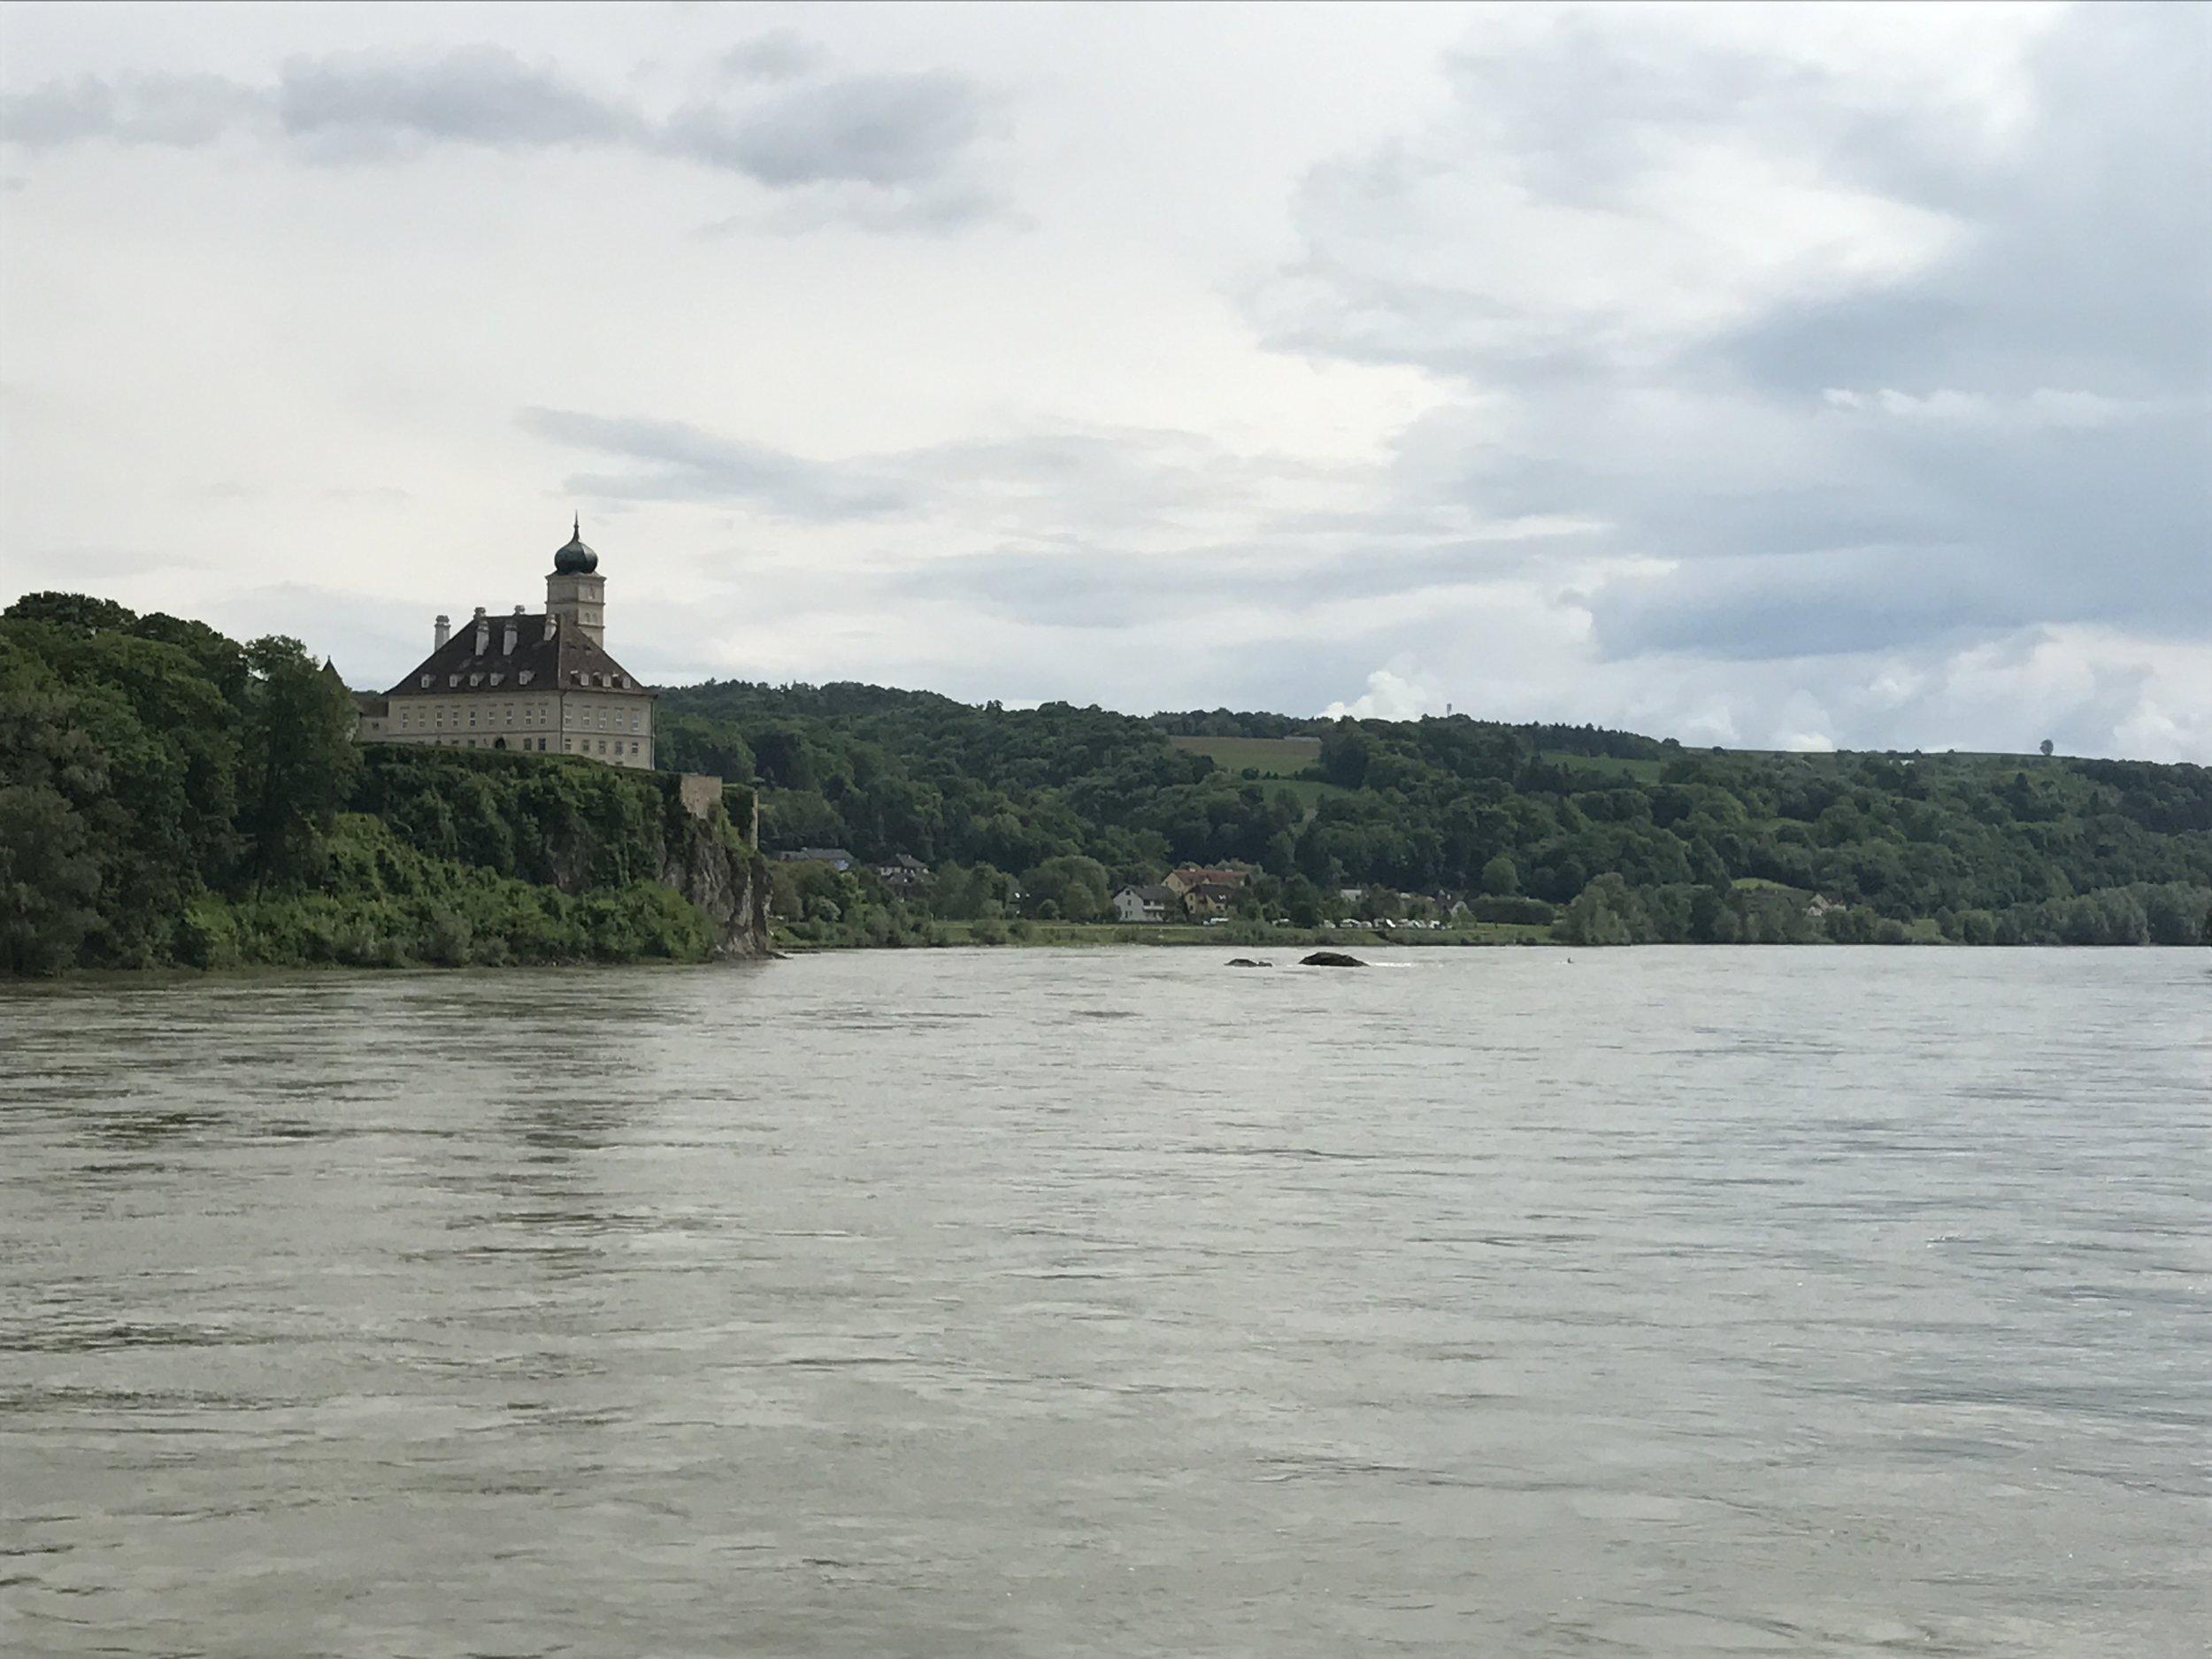 Somewhere on the Danube near Krems...